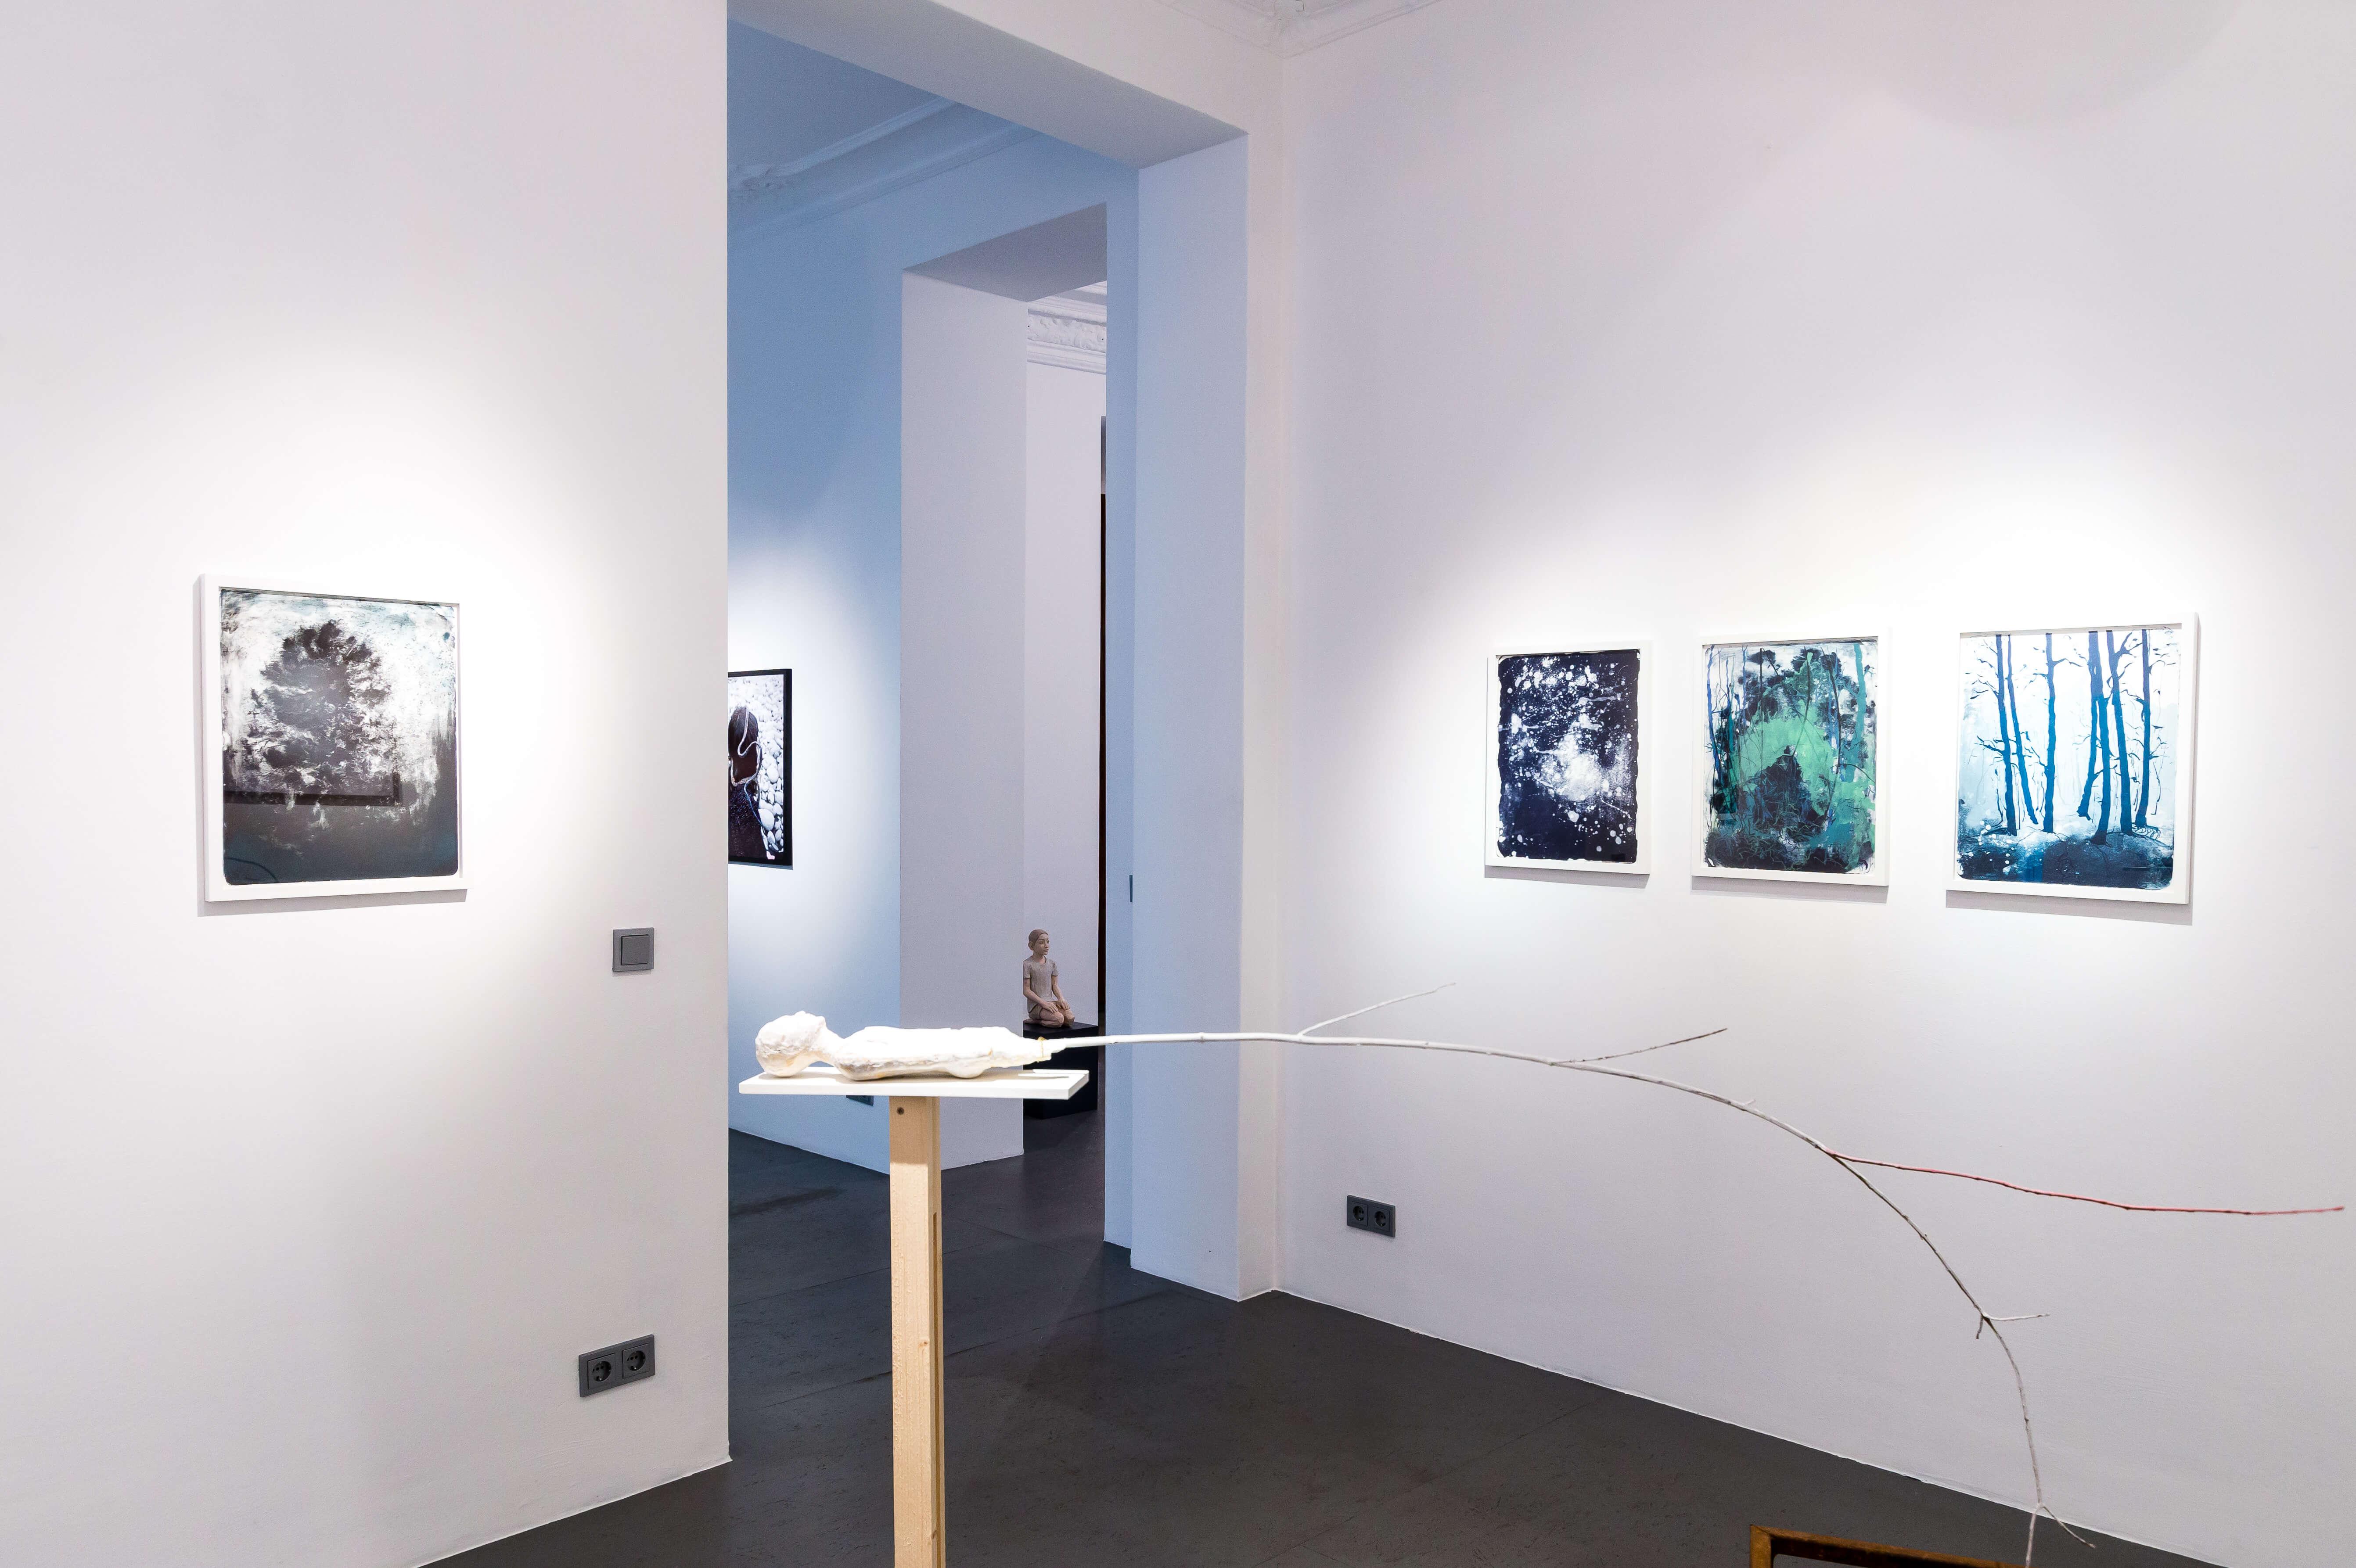 Foris - Galerie Burster, Katharina Albers, Lithographie und Wald